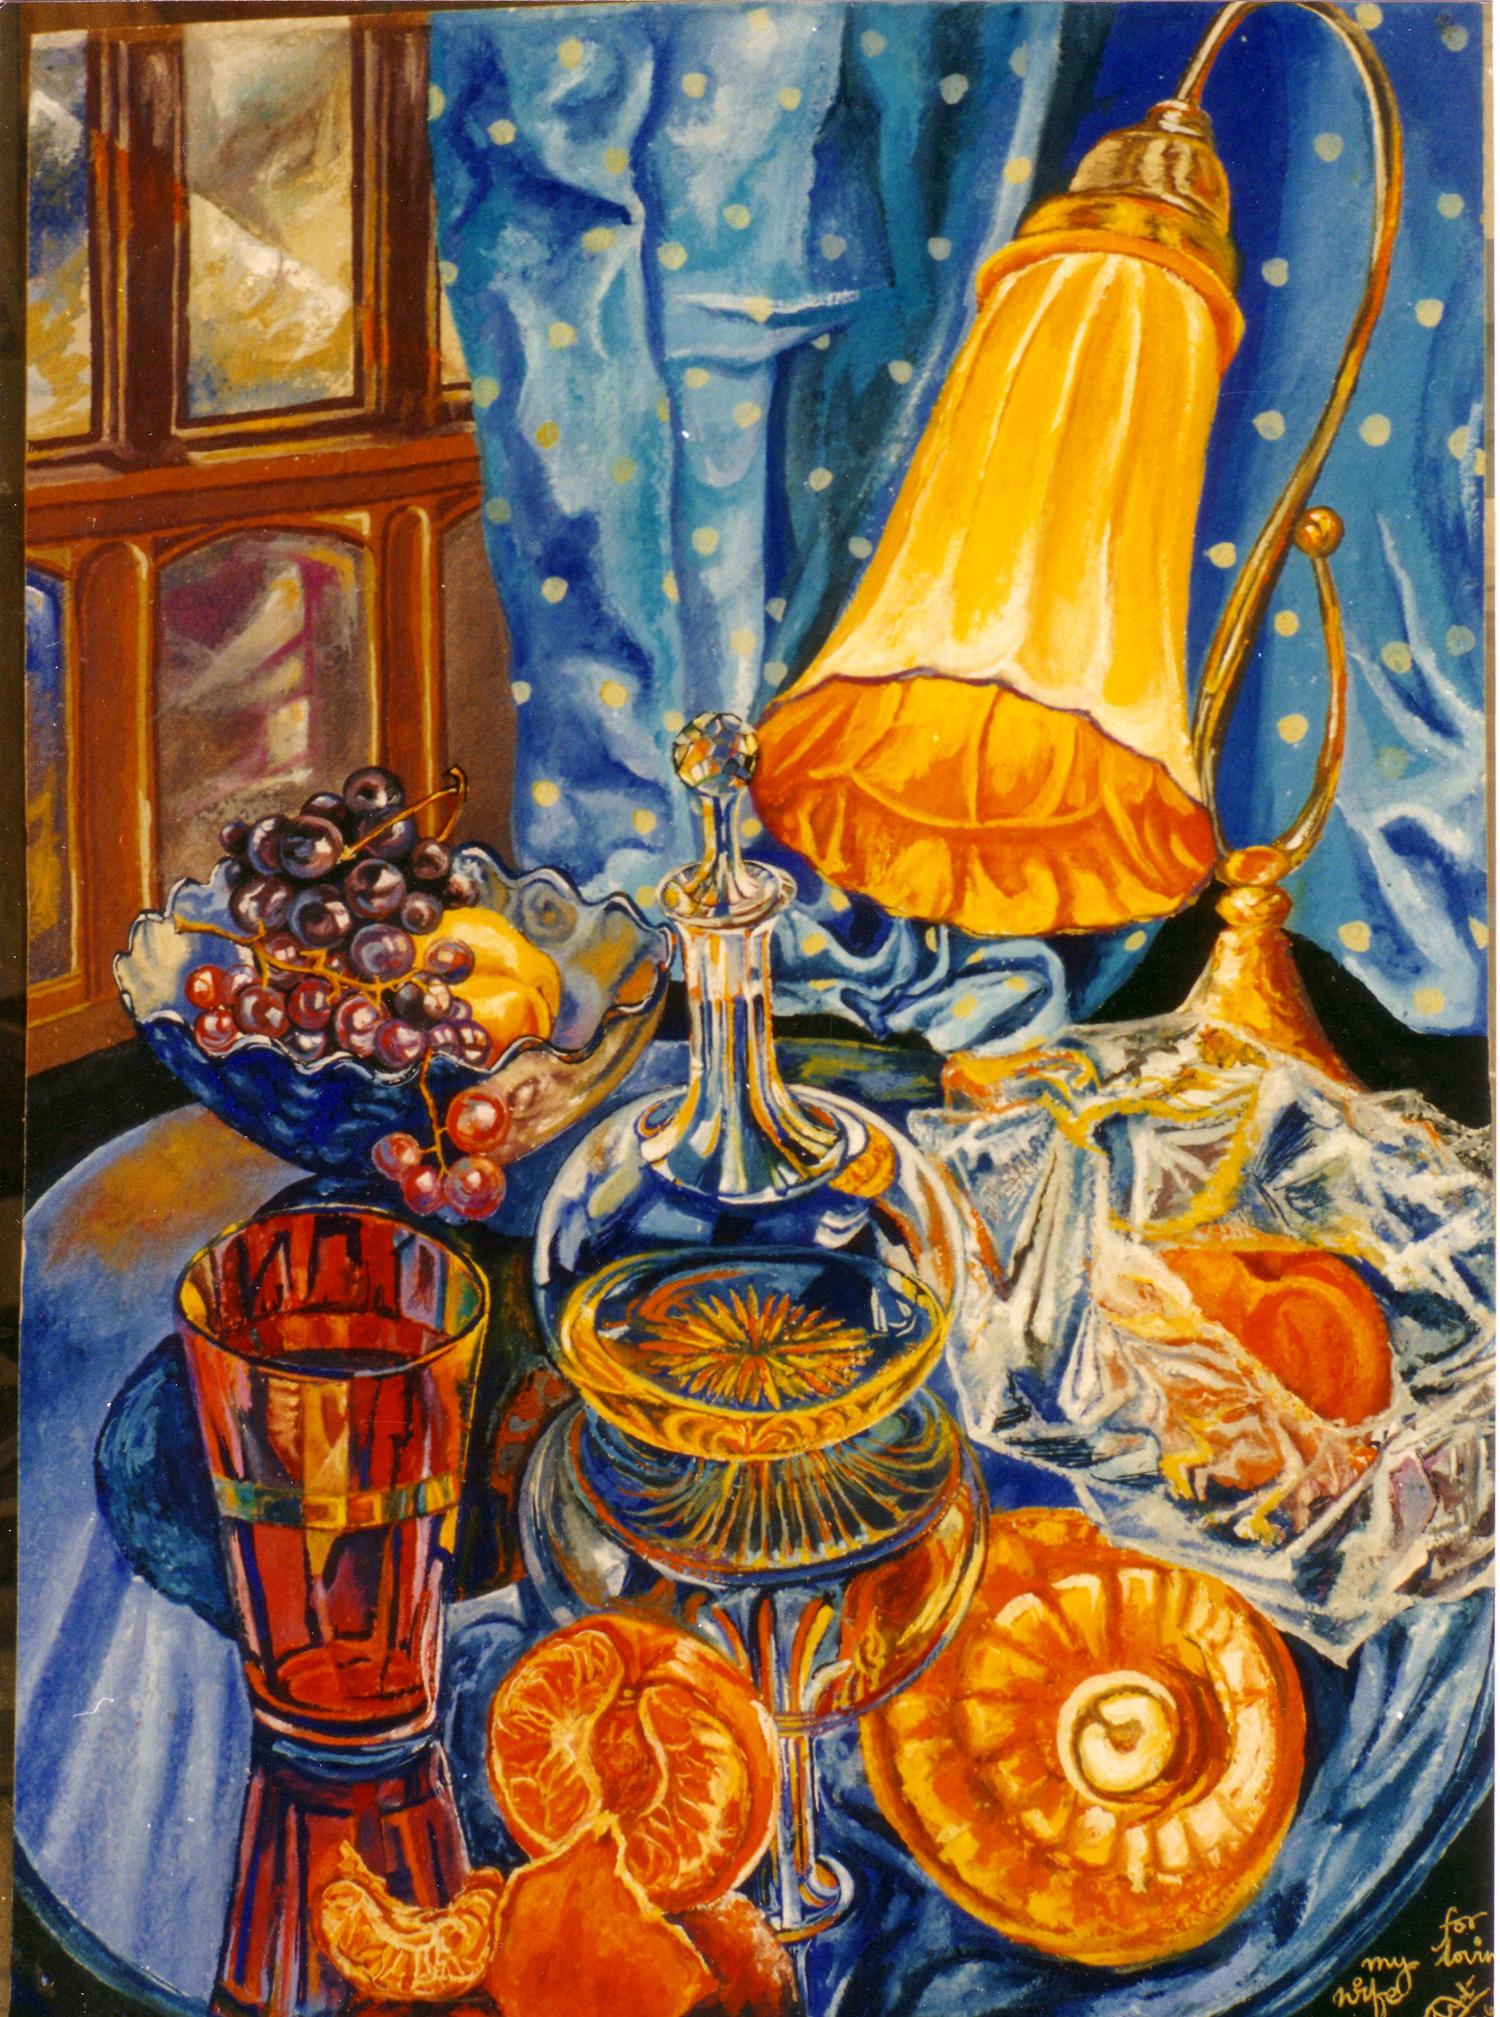 Still Life with Oranges and Orange Lamp